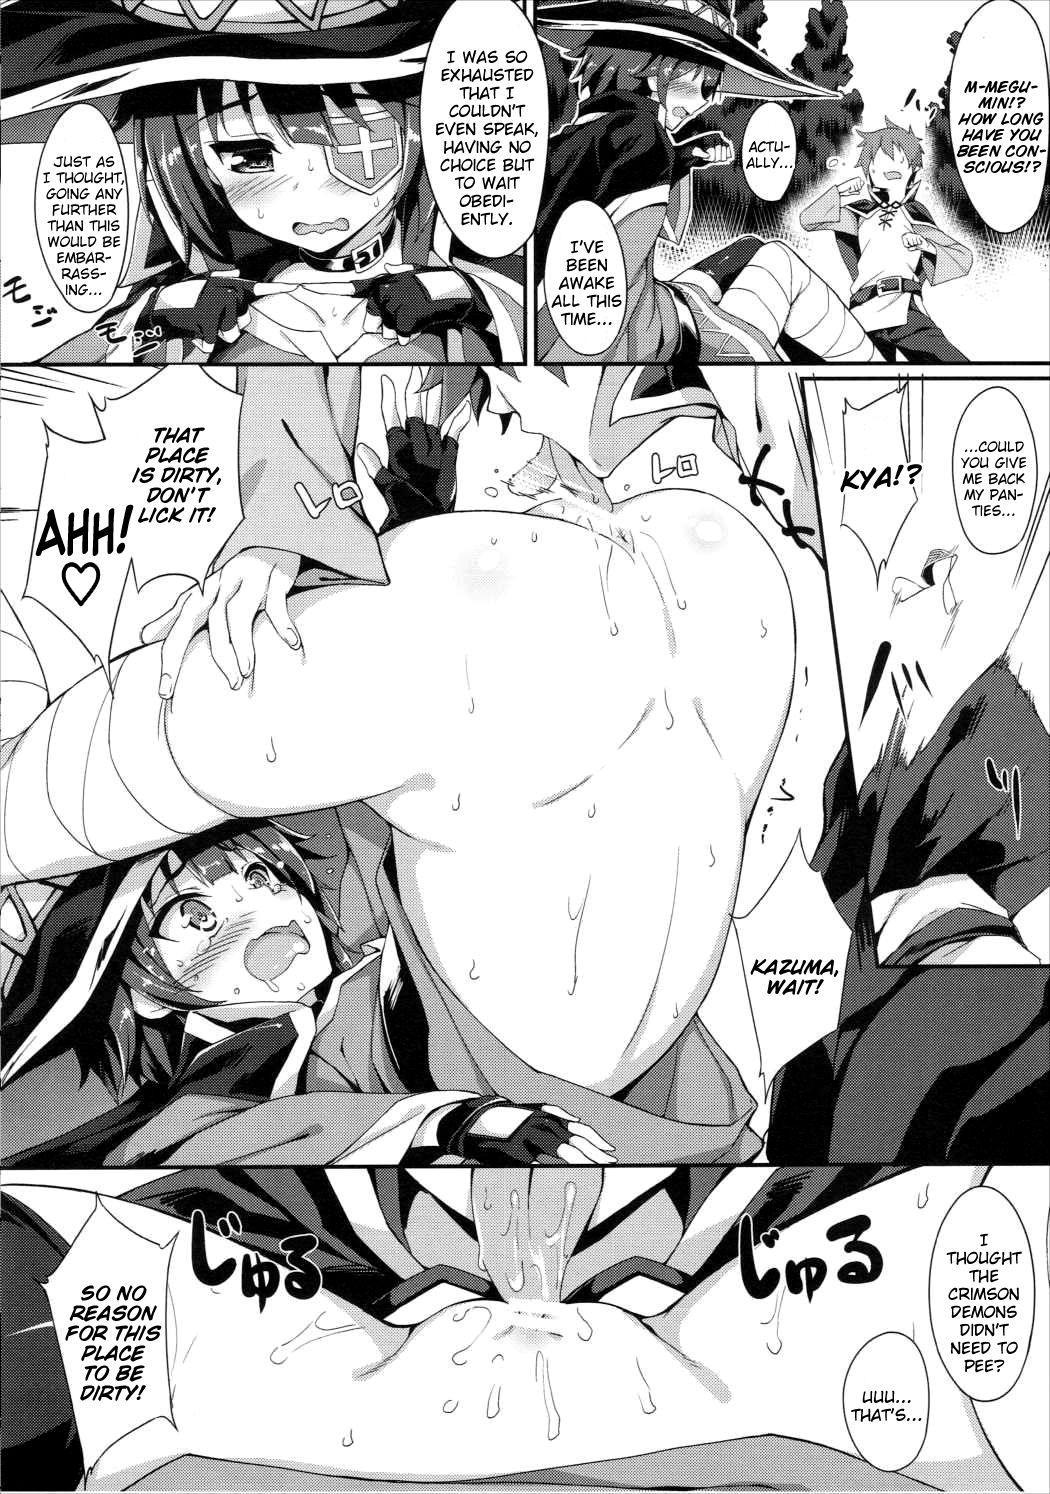 Megumin no Bakuretsu Mahou After | Megumin's Explosion Magic After 8